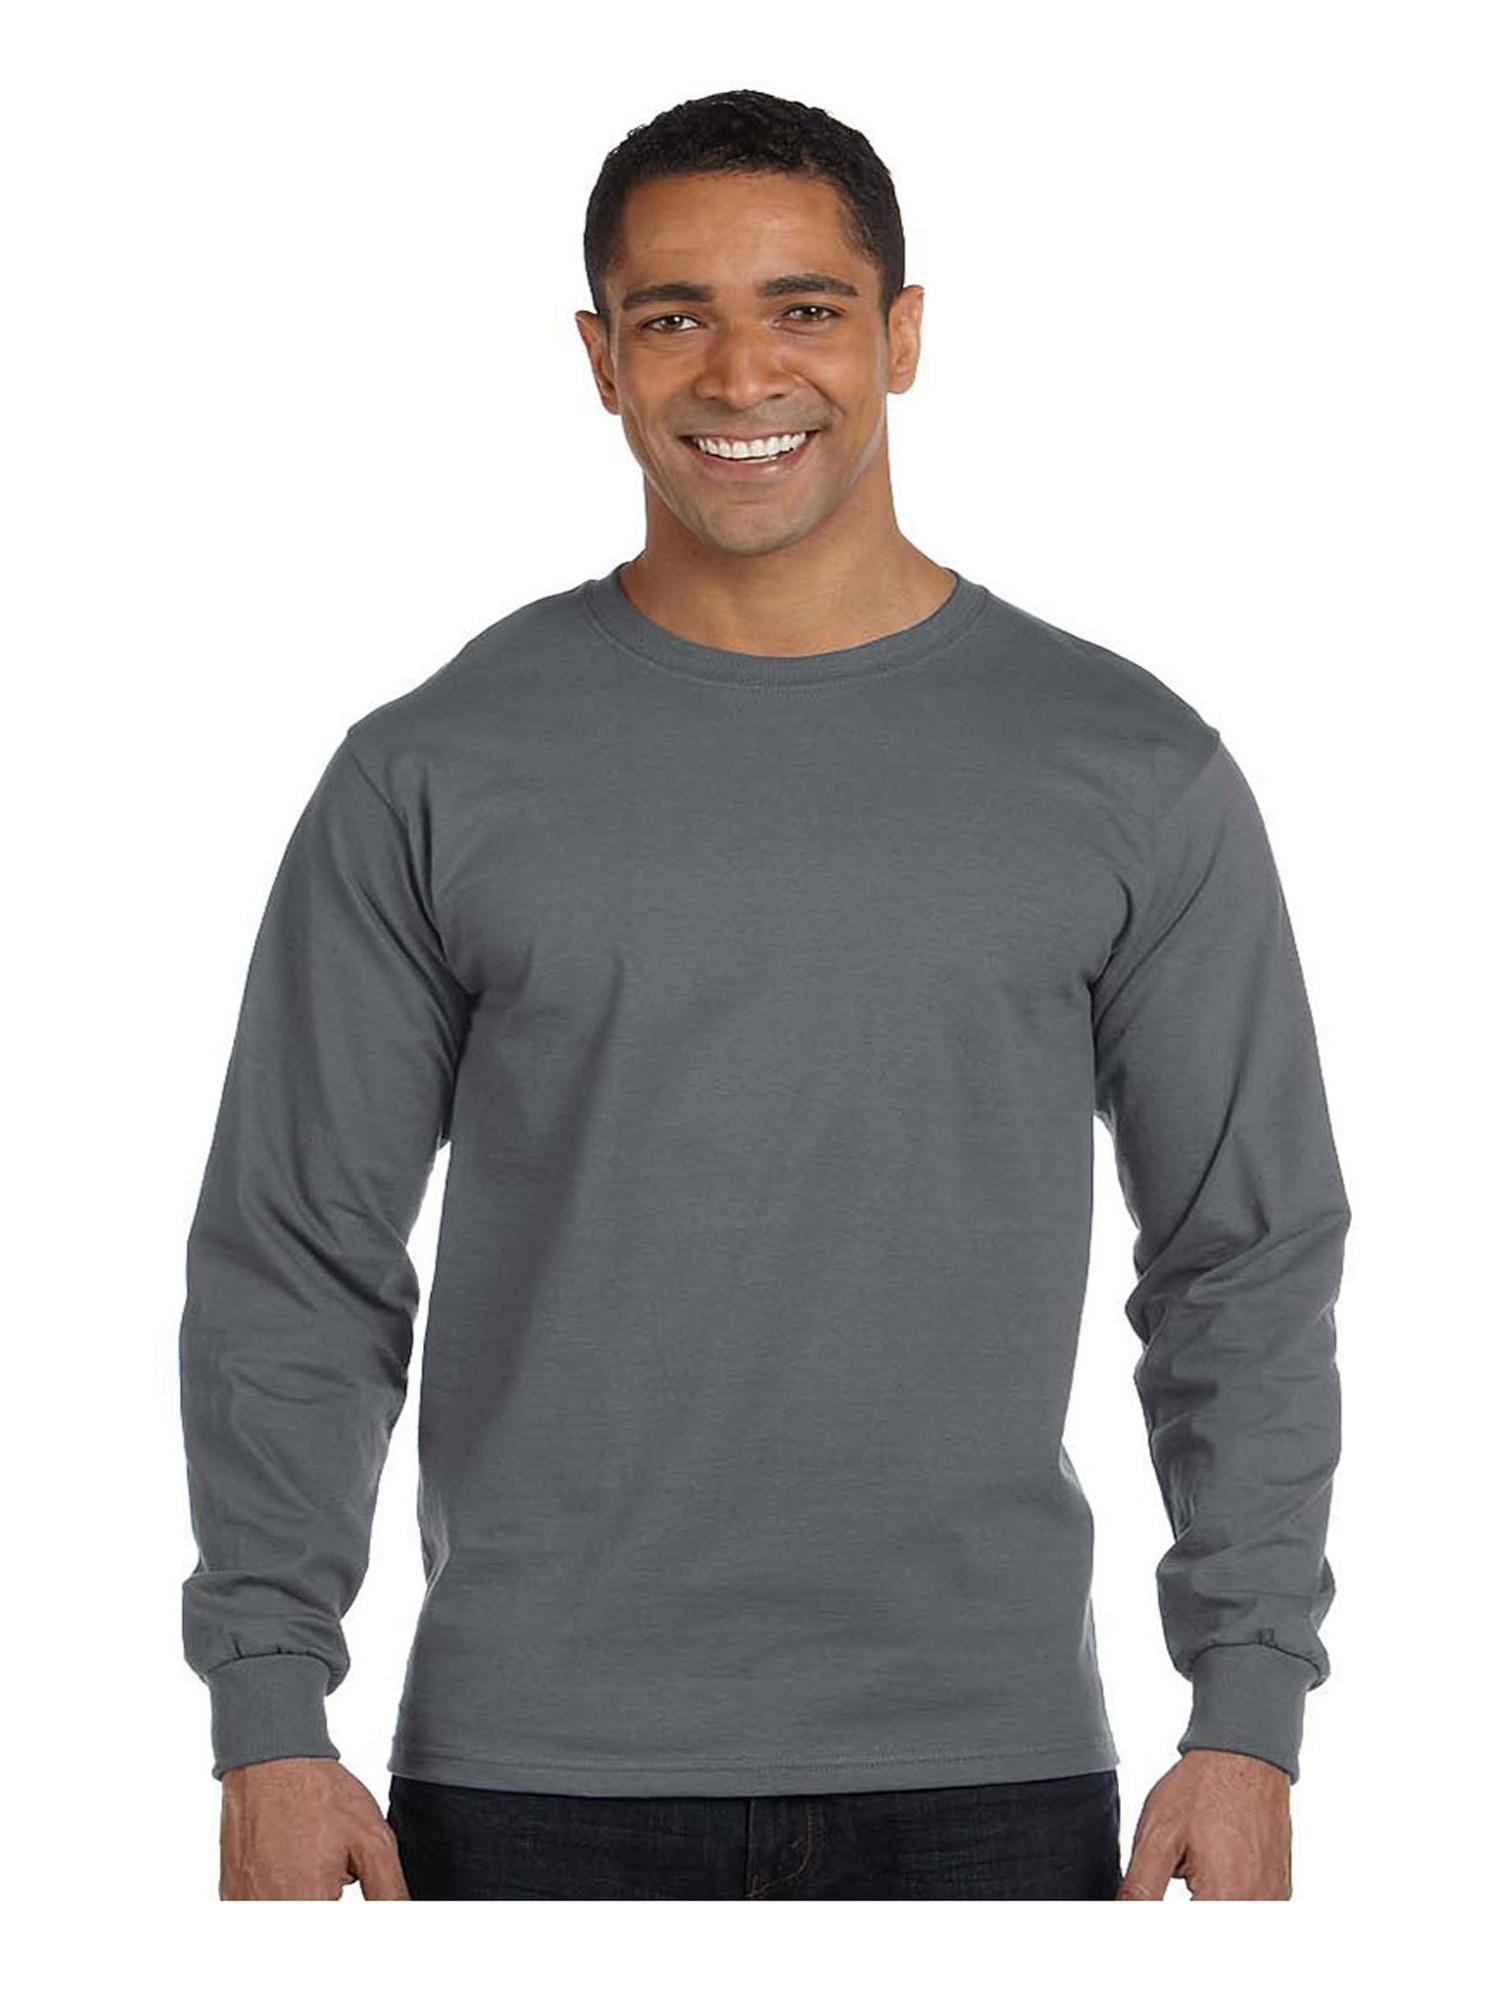 Fruit Of The Loom Lofteez Hd Long Sleeve T-Shirt, Style HD6LR